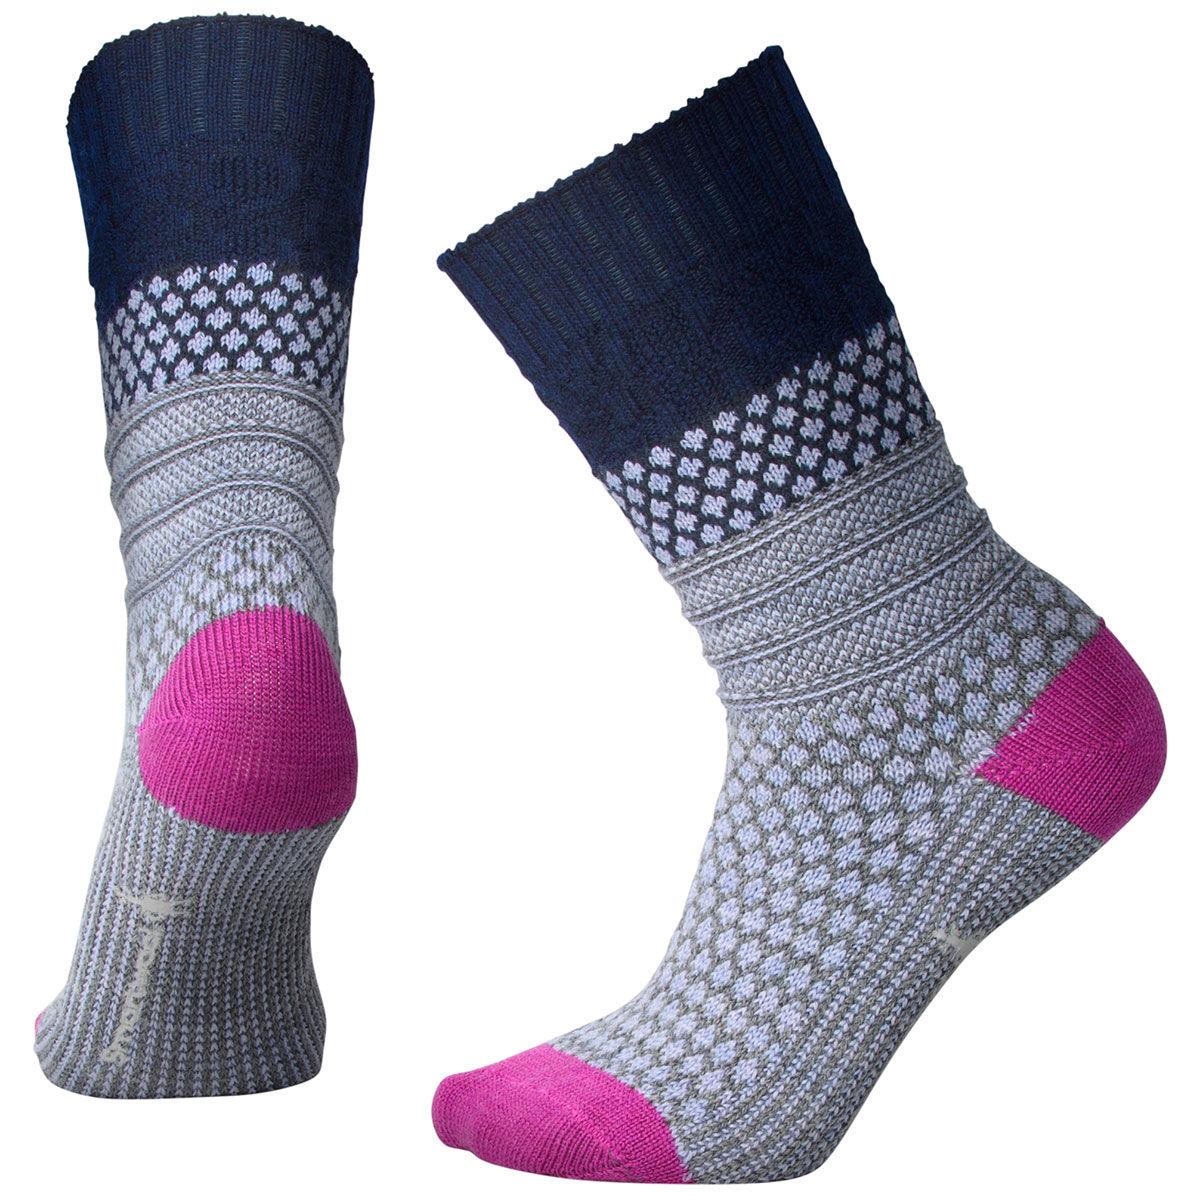 Smartwool Women's Popcorn Cable Socks - Blue, S